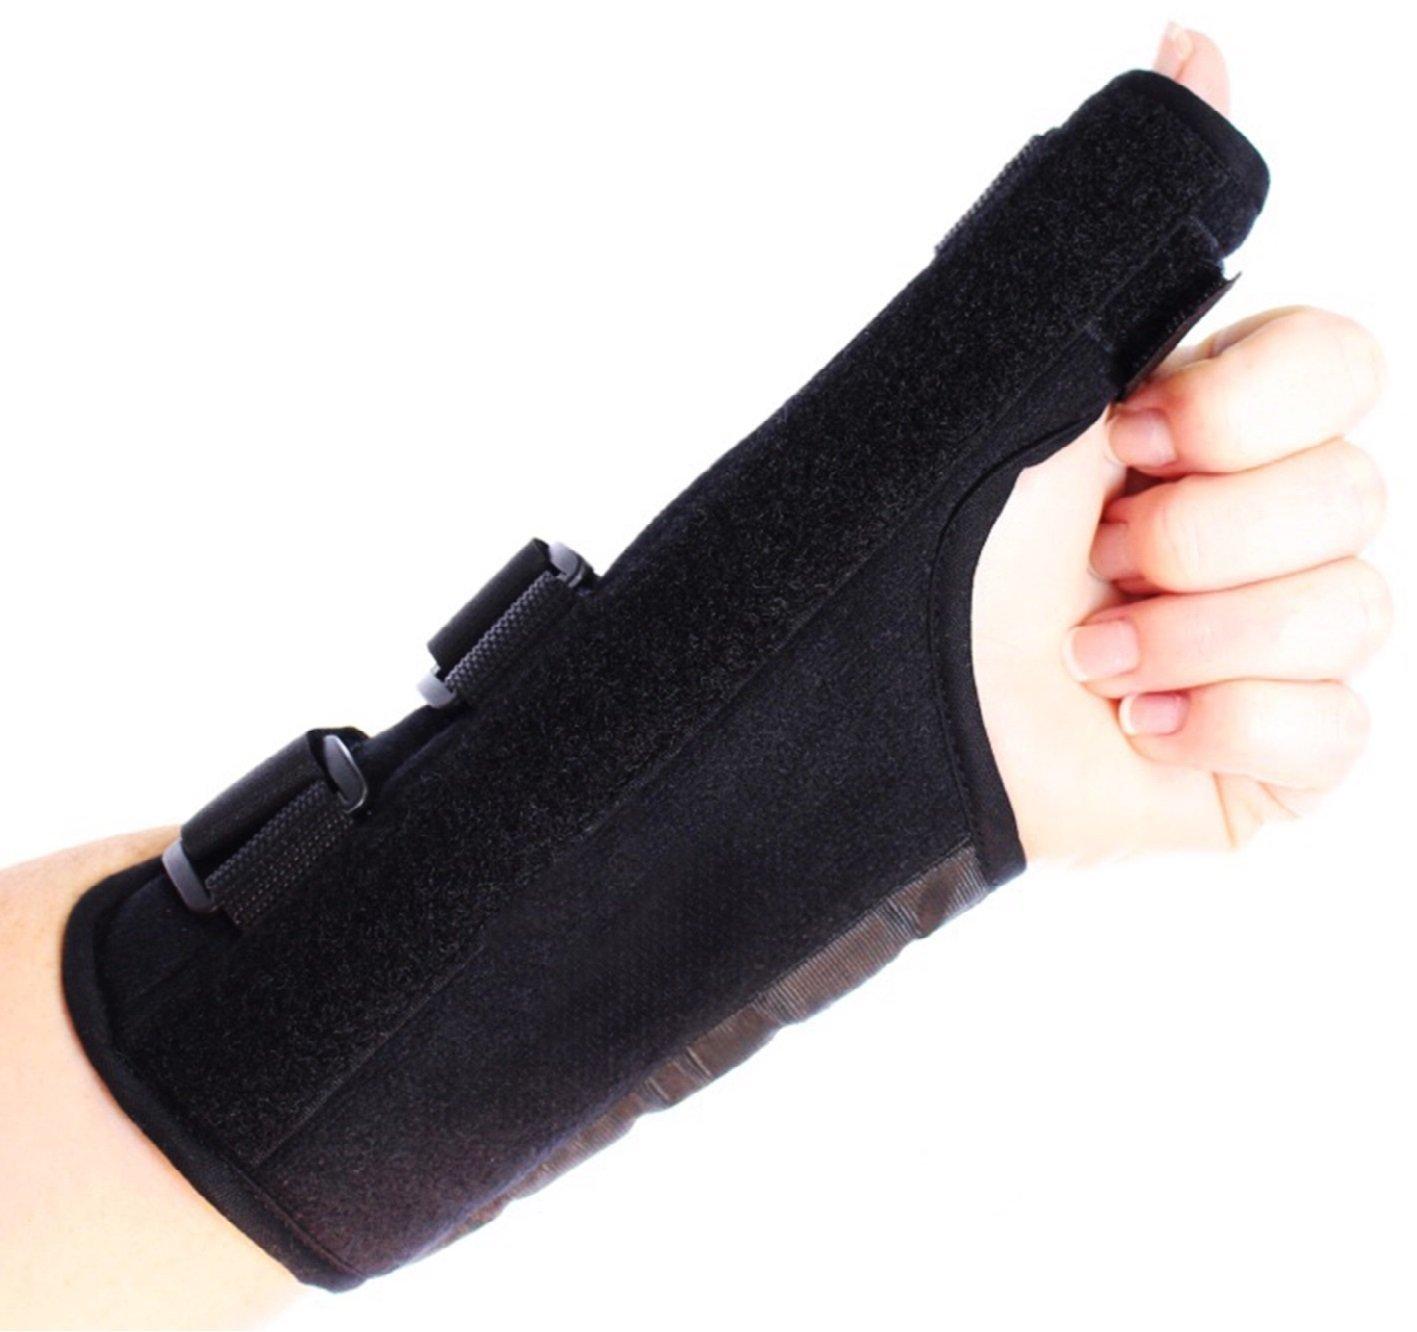 Comfort Care Thumb Support Brace - Left Hand - Fitness - Rheumatoid Arthritis - Training - Health - Beauty - Men - Women - Hands - Treatment - Exercise - Joint - Wellness - Muscle - Hurt - Severe - Aching - Swollen - Painful - Personal - Sore - Remedies - Rheumatism - Finger - Aids - Relief -